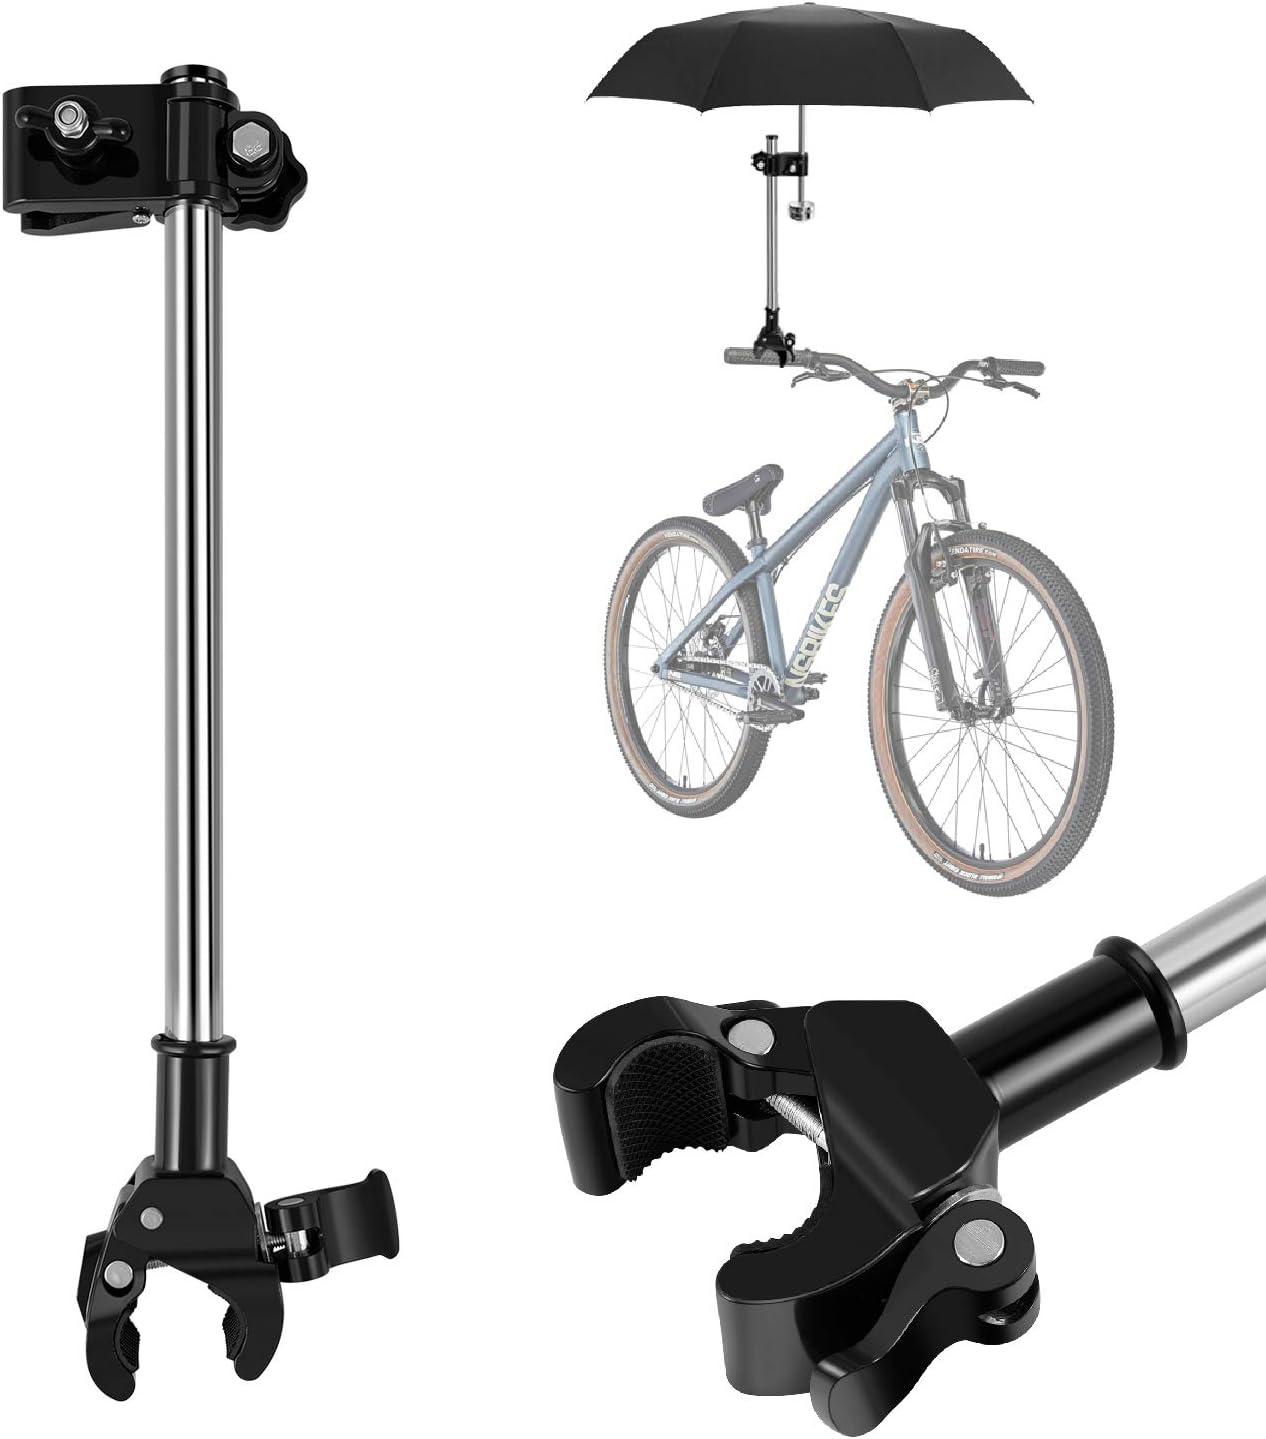 mango de tubo de longitud ajustable montura universal para manillar accesorios para bicicleta cochecito de ruedas Flexzion Soporte para paraguas de bicicleta montaje r/ápido